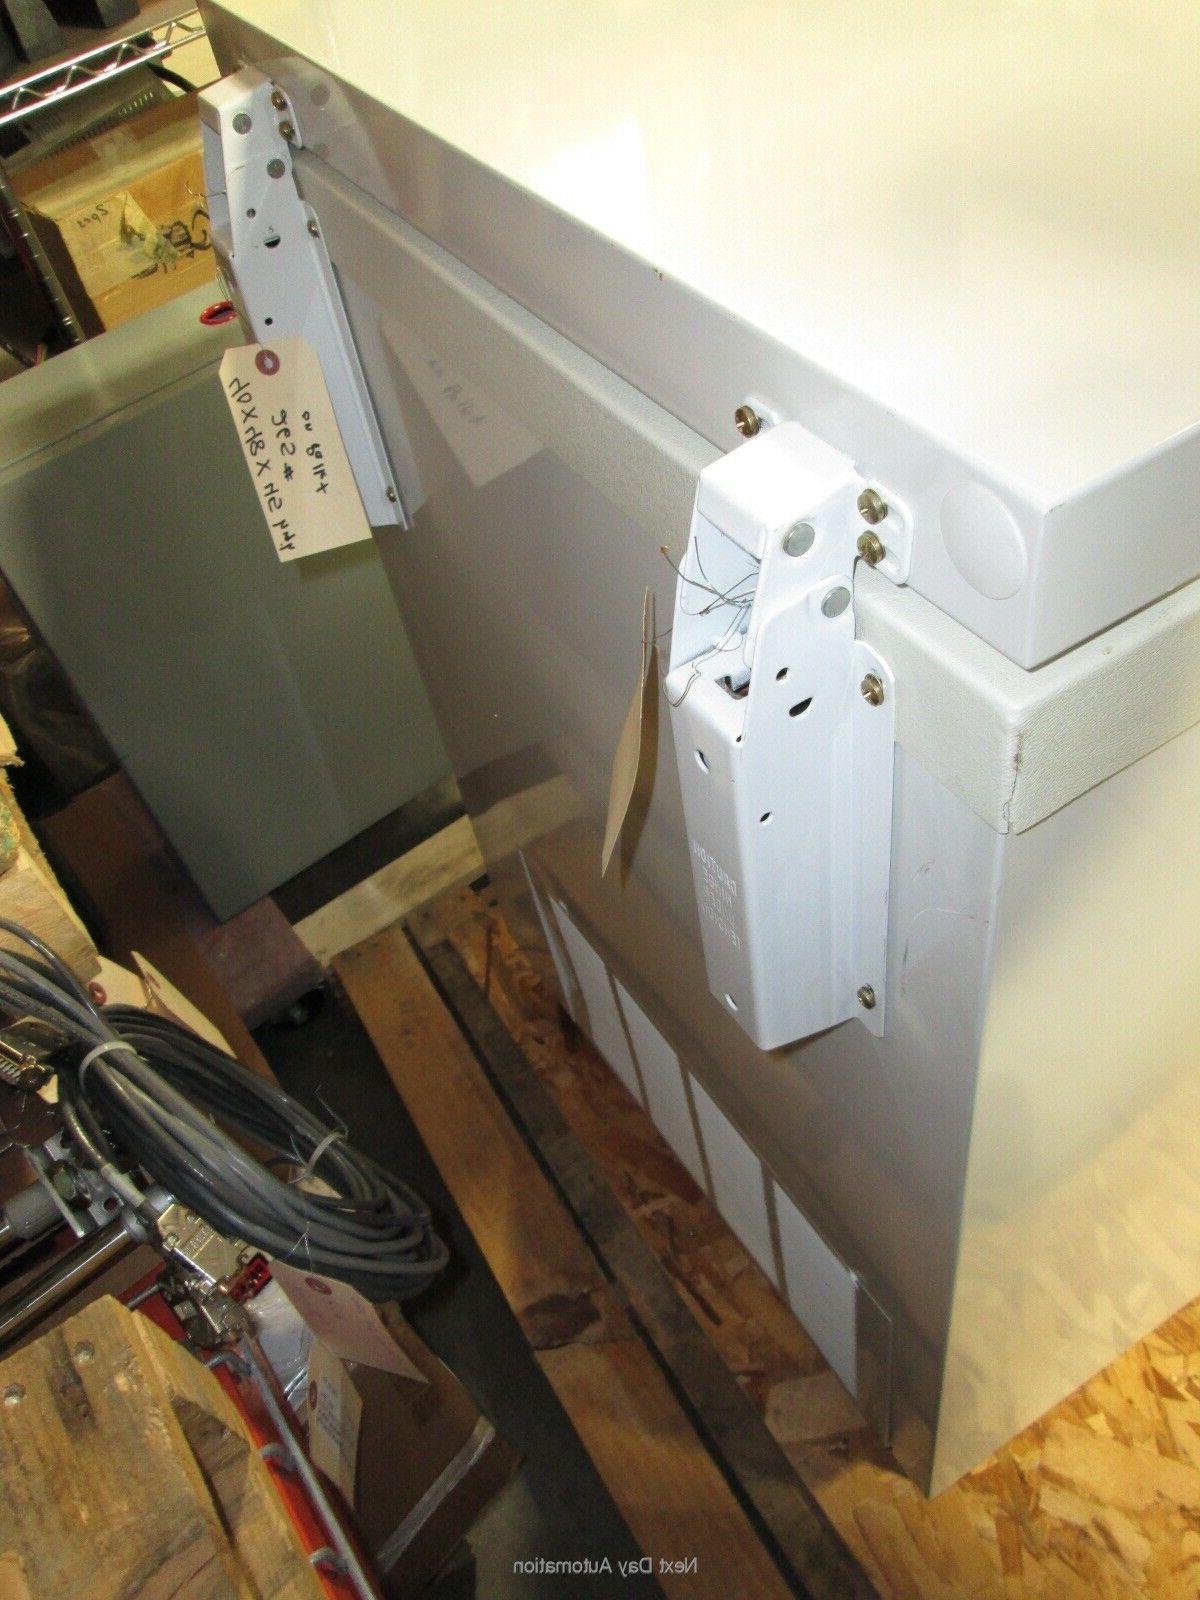 Kelvinator Freezer to w/ Recorder